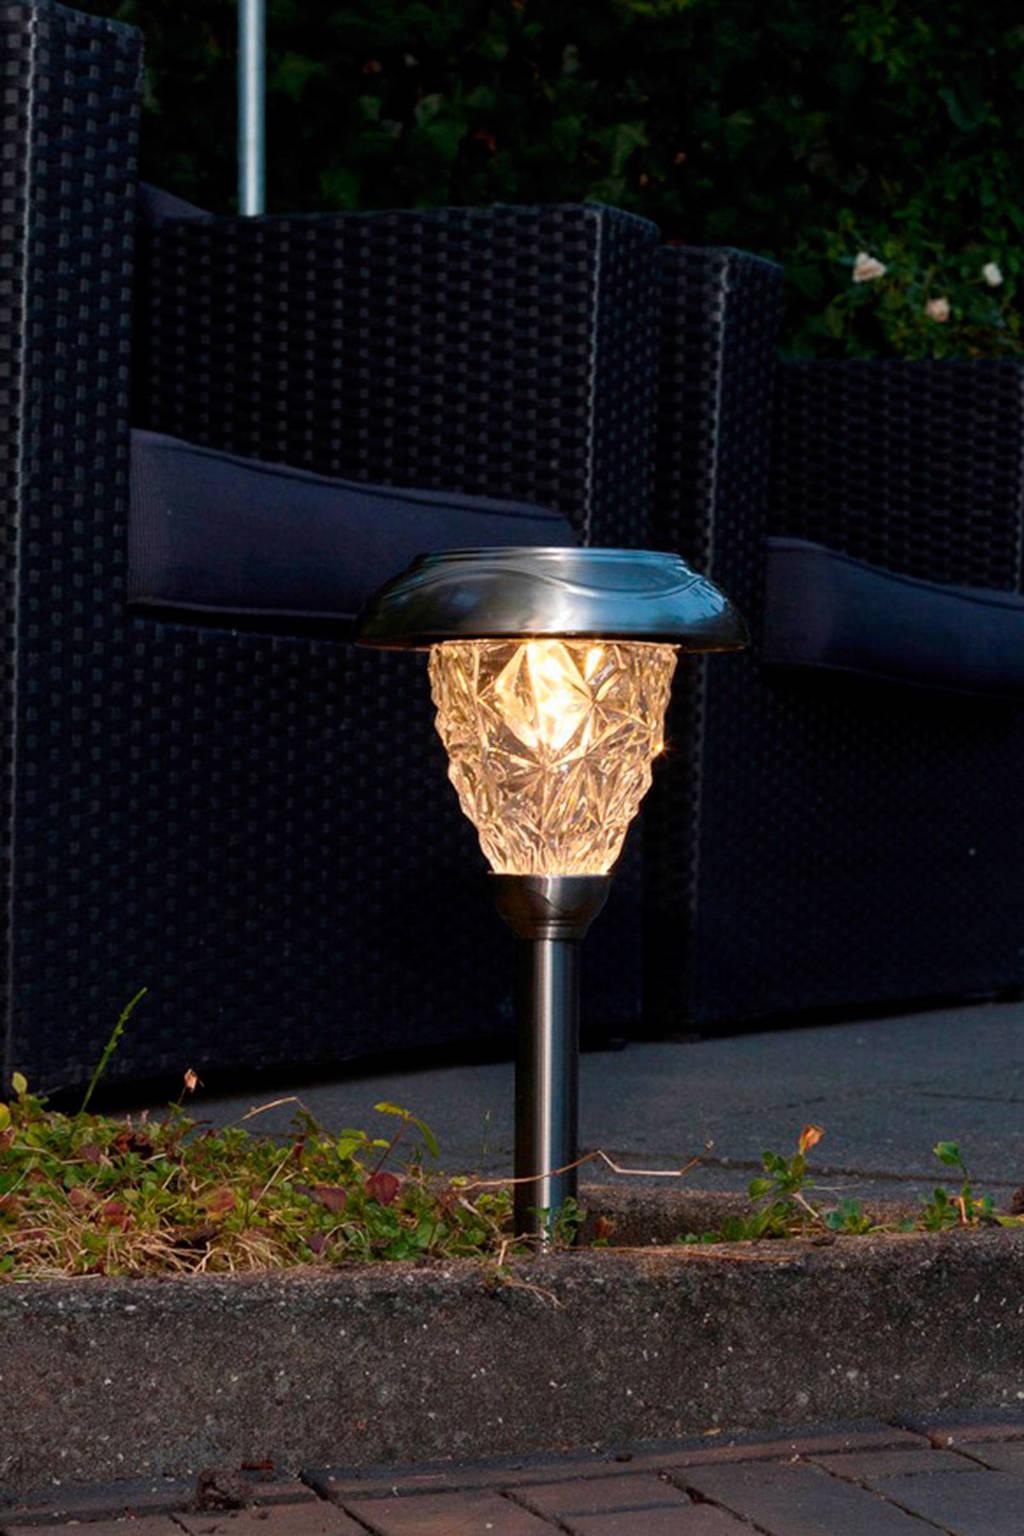 Luxform sokkellamp Saint-Etienne (solar), Grijs